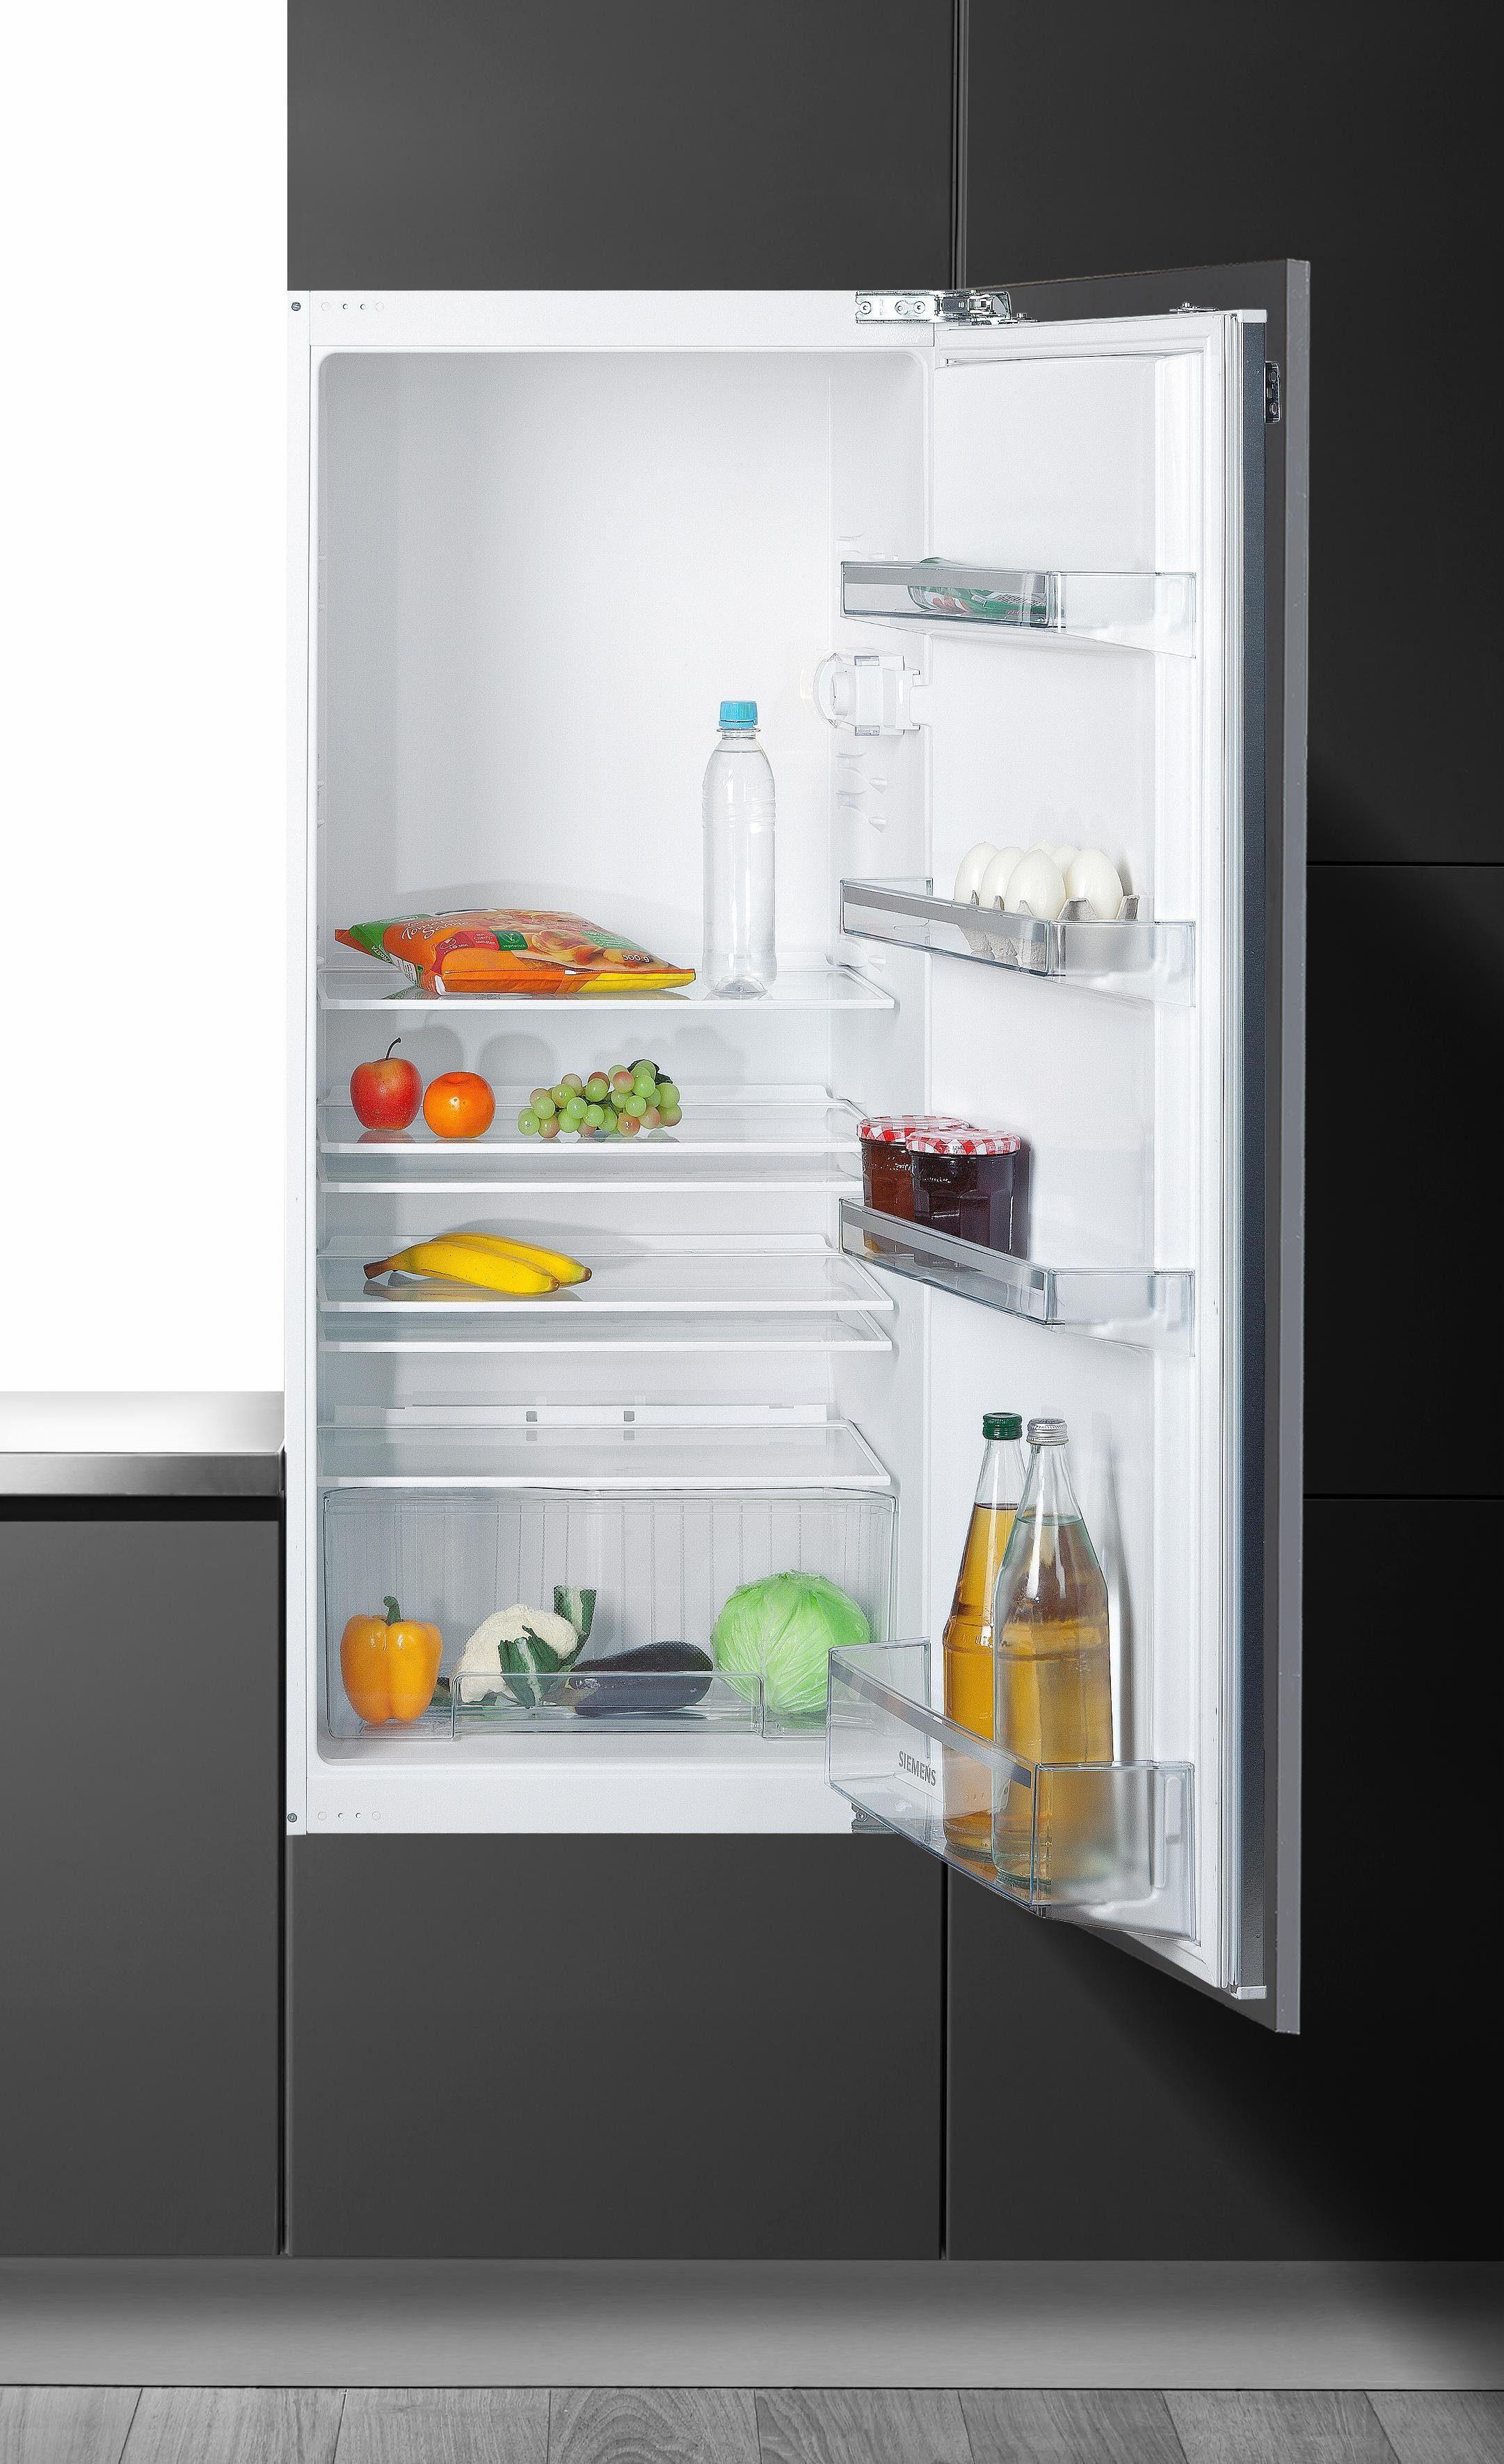 Siemens integrierbarer Einbau-Kühlschrank KI24RV60, A++, 122,5 cm, mit Abtauautomatik